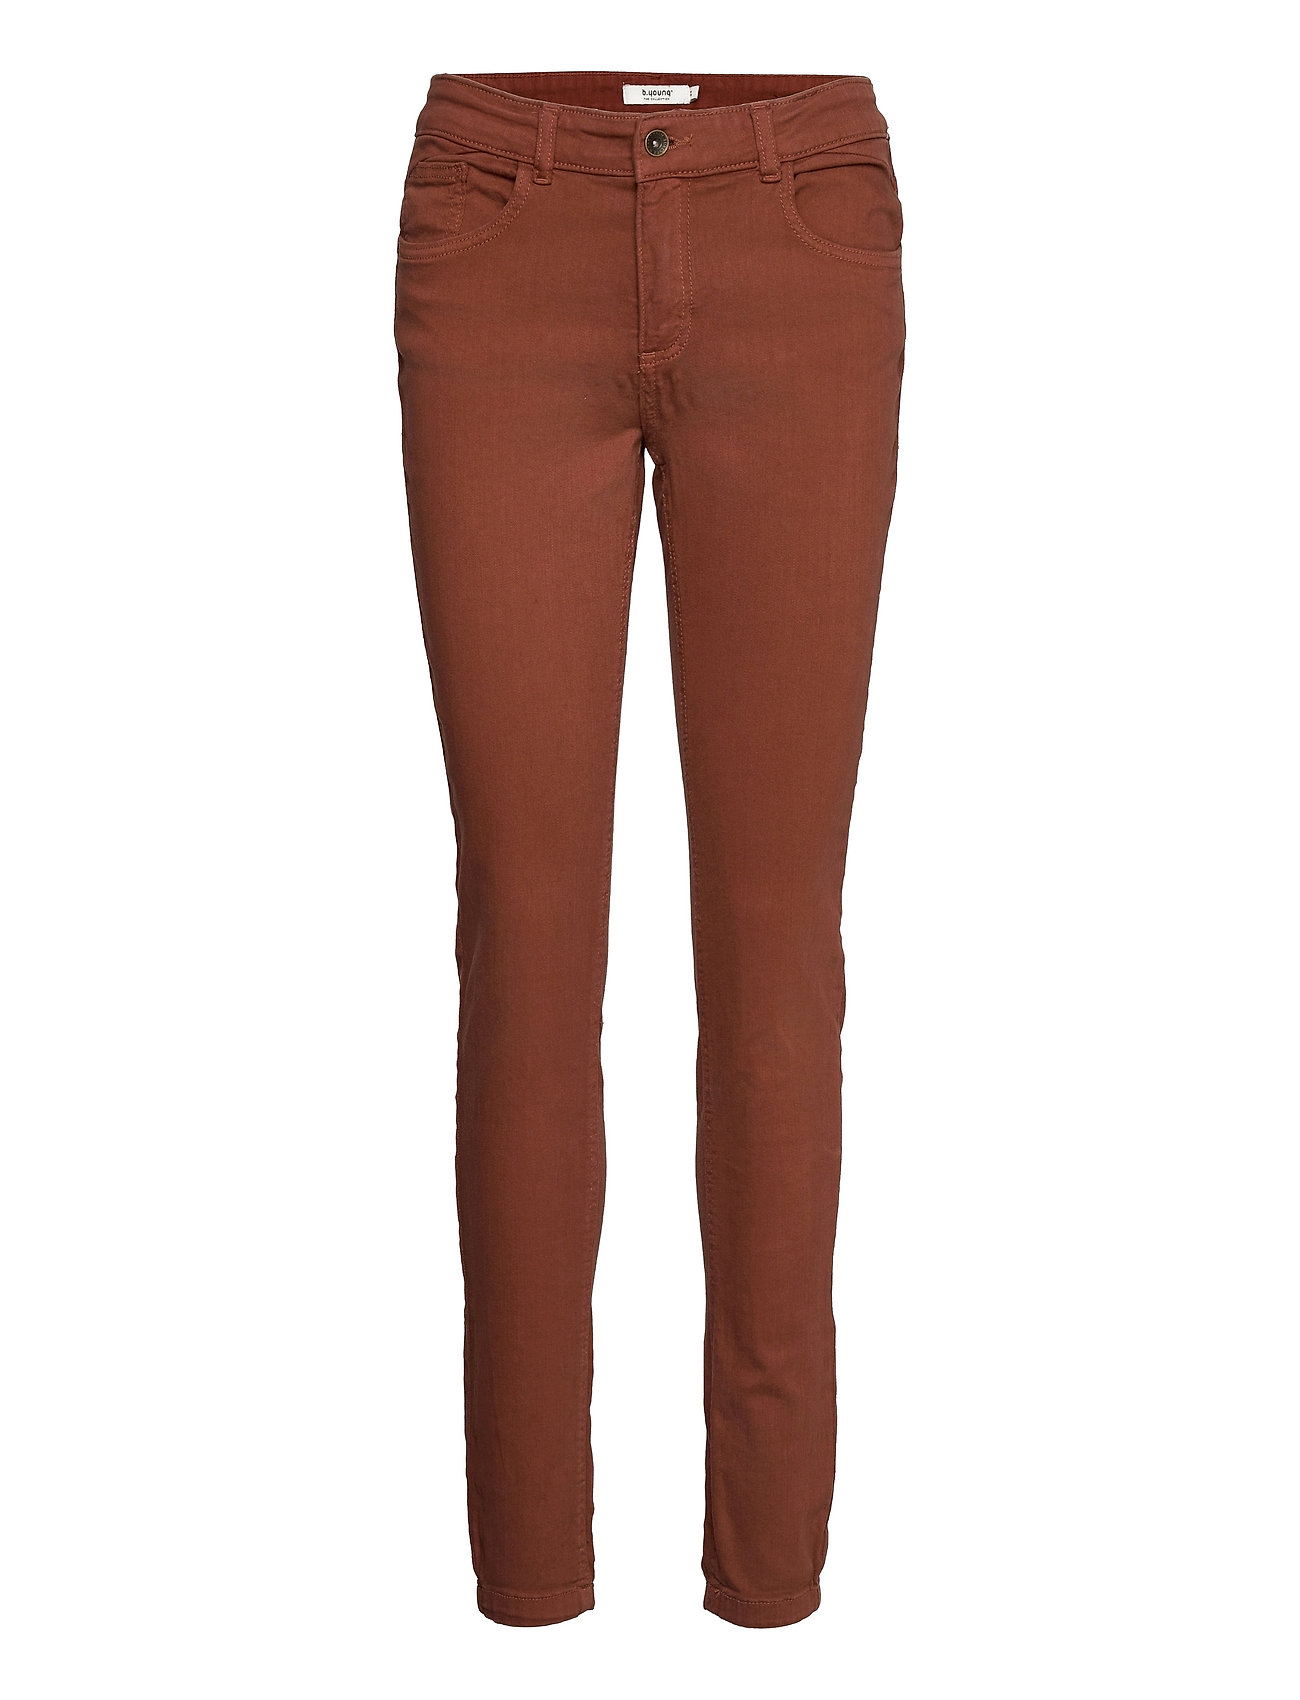 Lola Luni Jeans - Slim Jeans Brun B.young